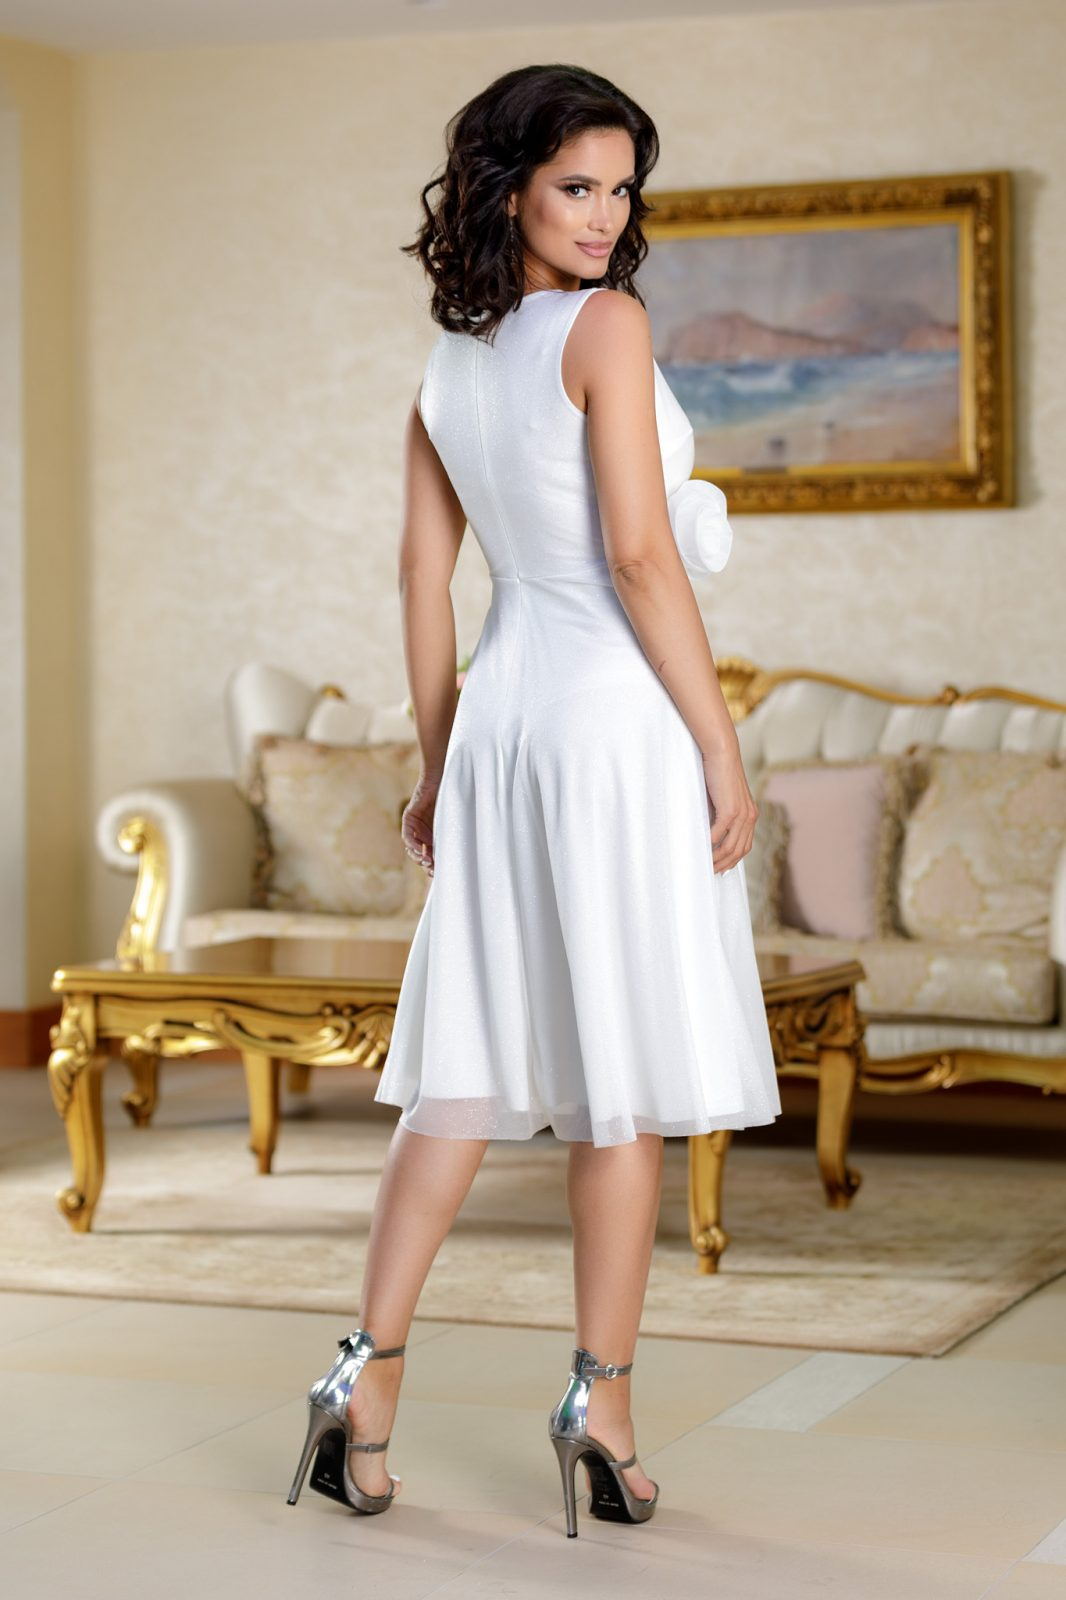 Rosalinda Άσπρο Φόρεμα 4699